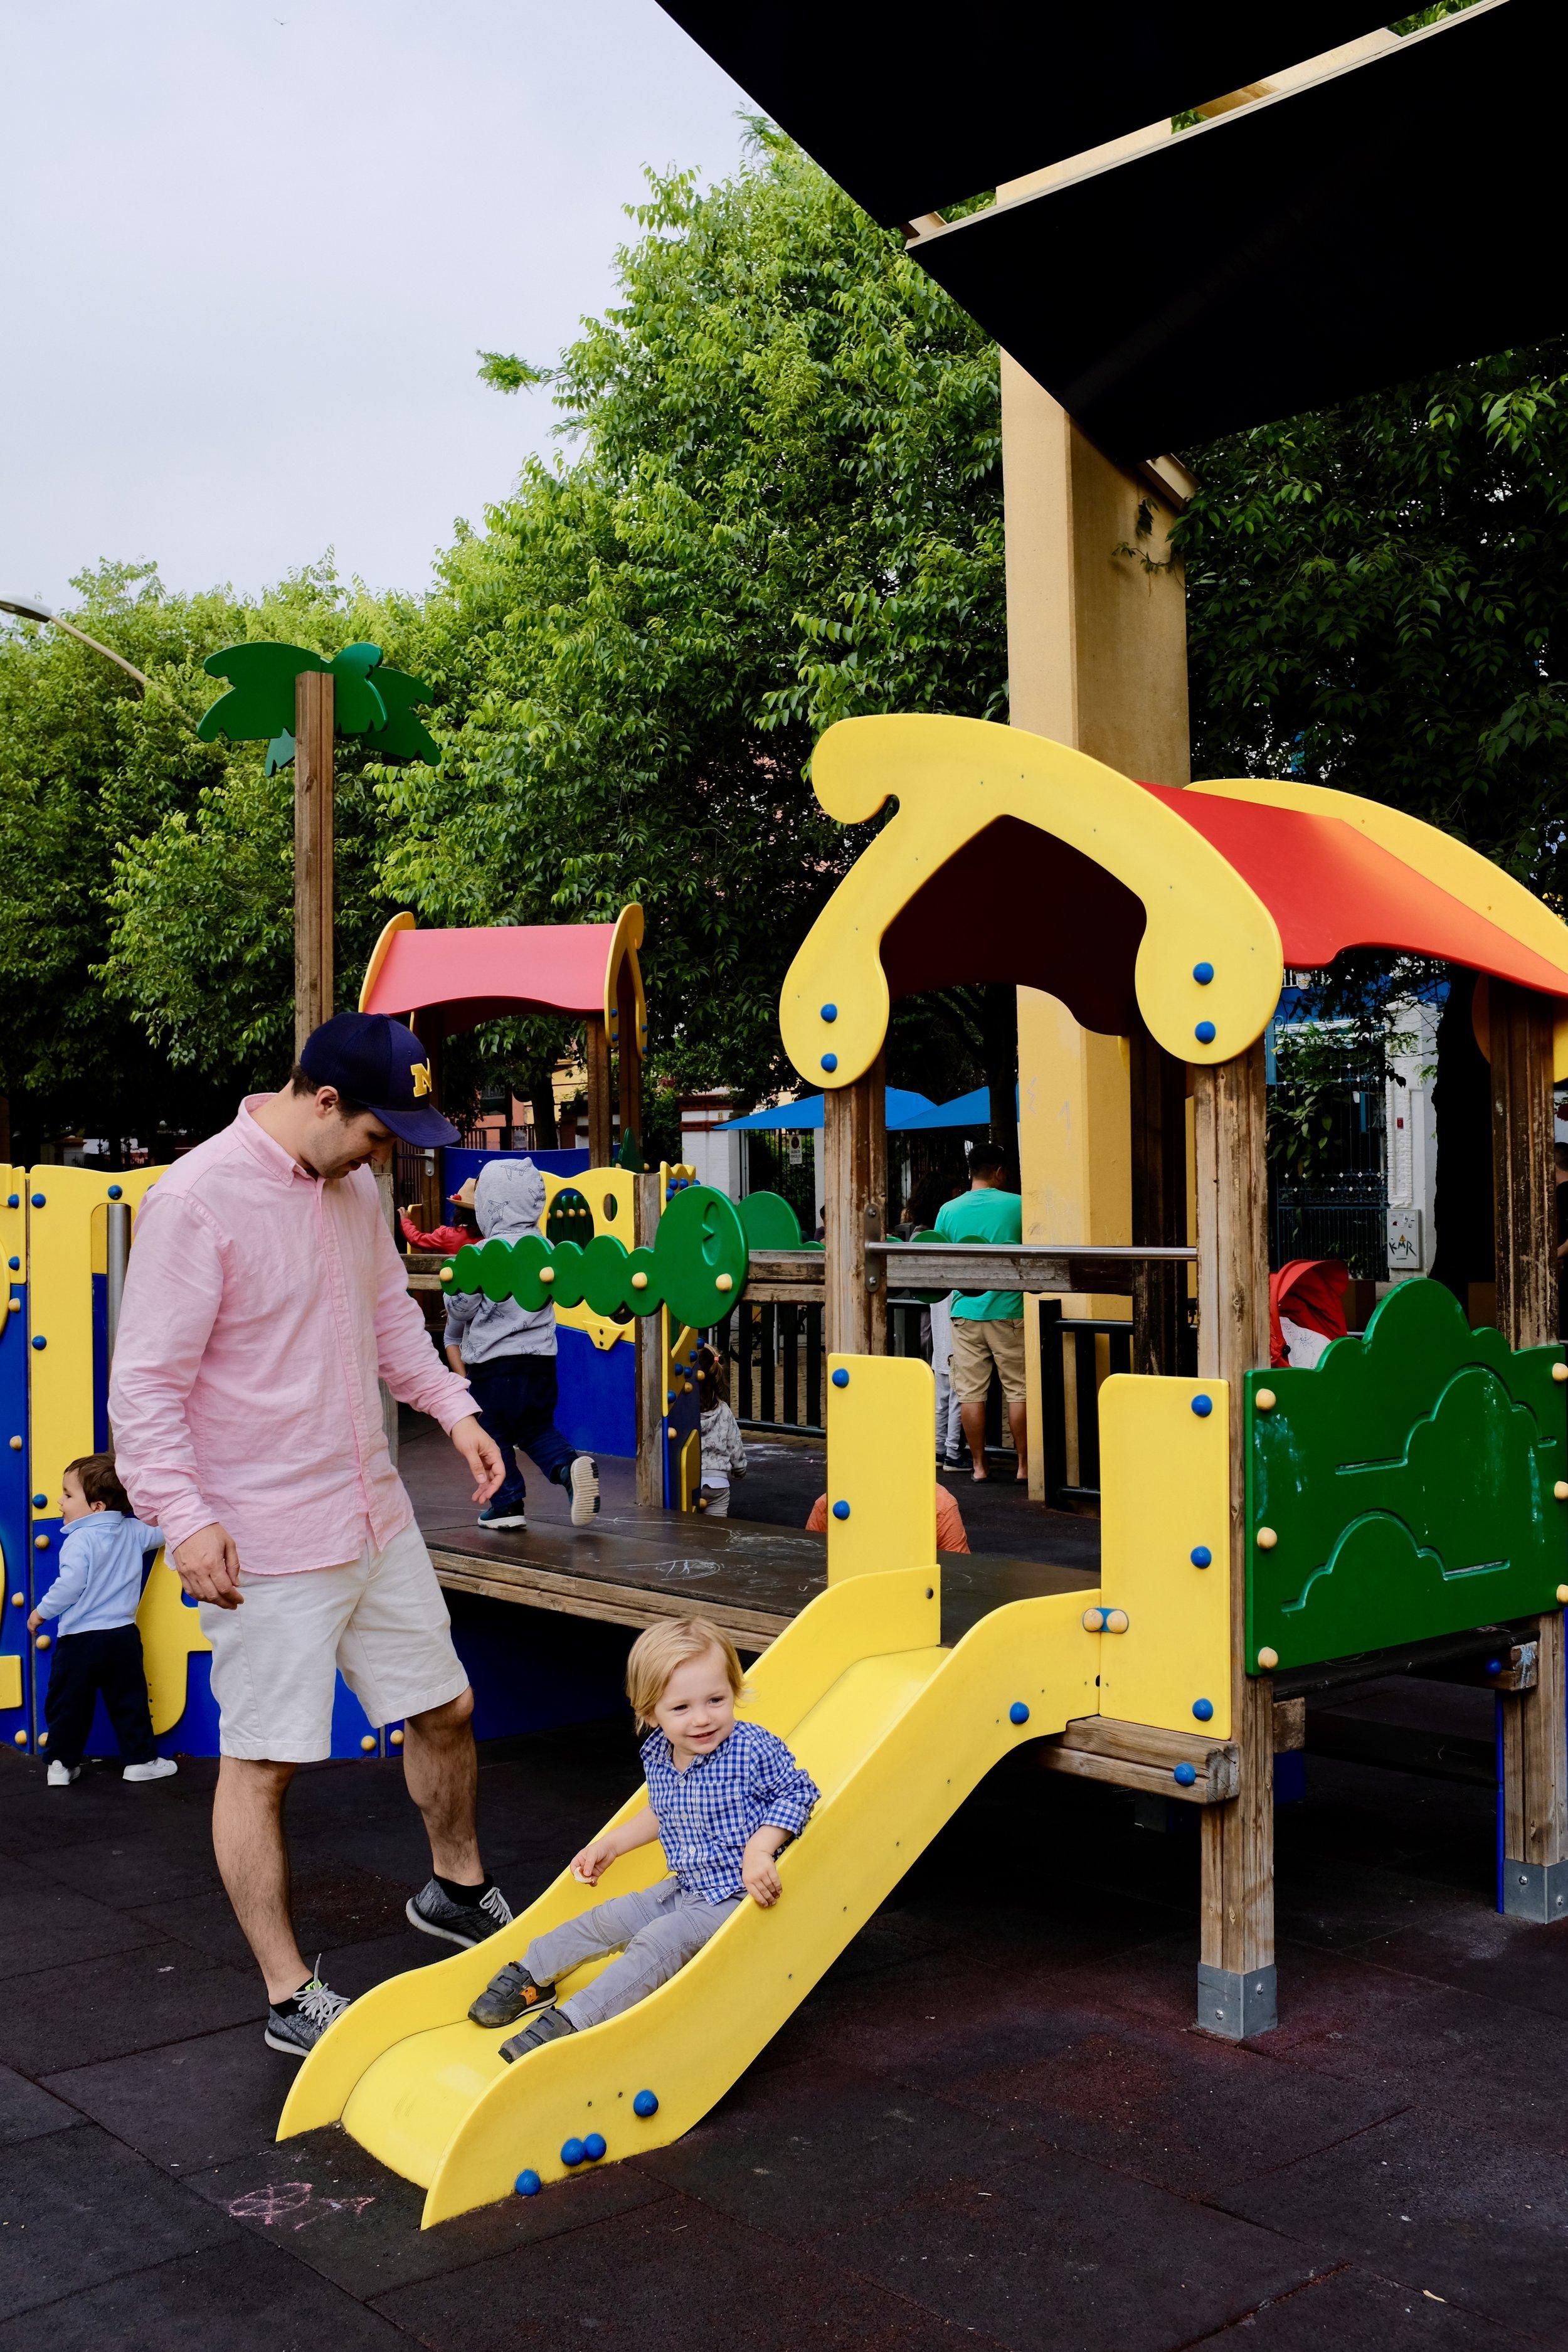 Alameda de Hercules Playground_City Nibbler_Seville